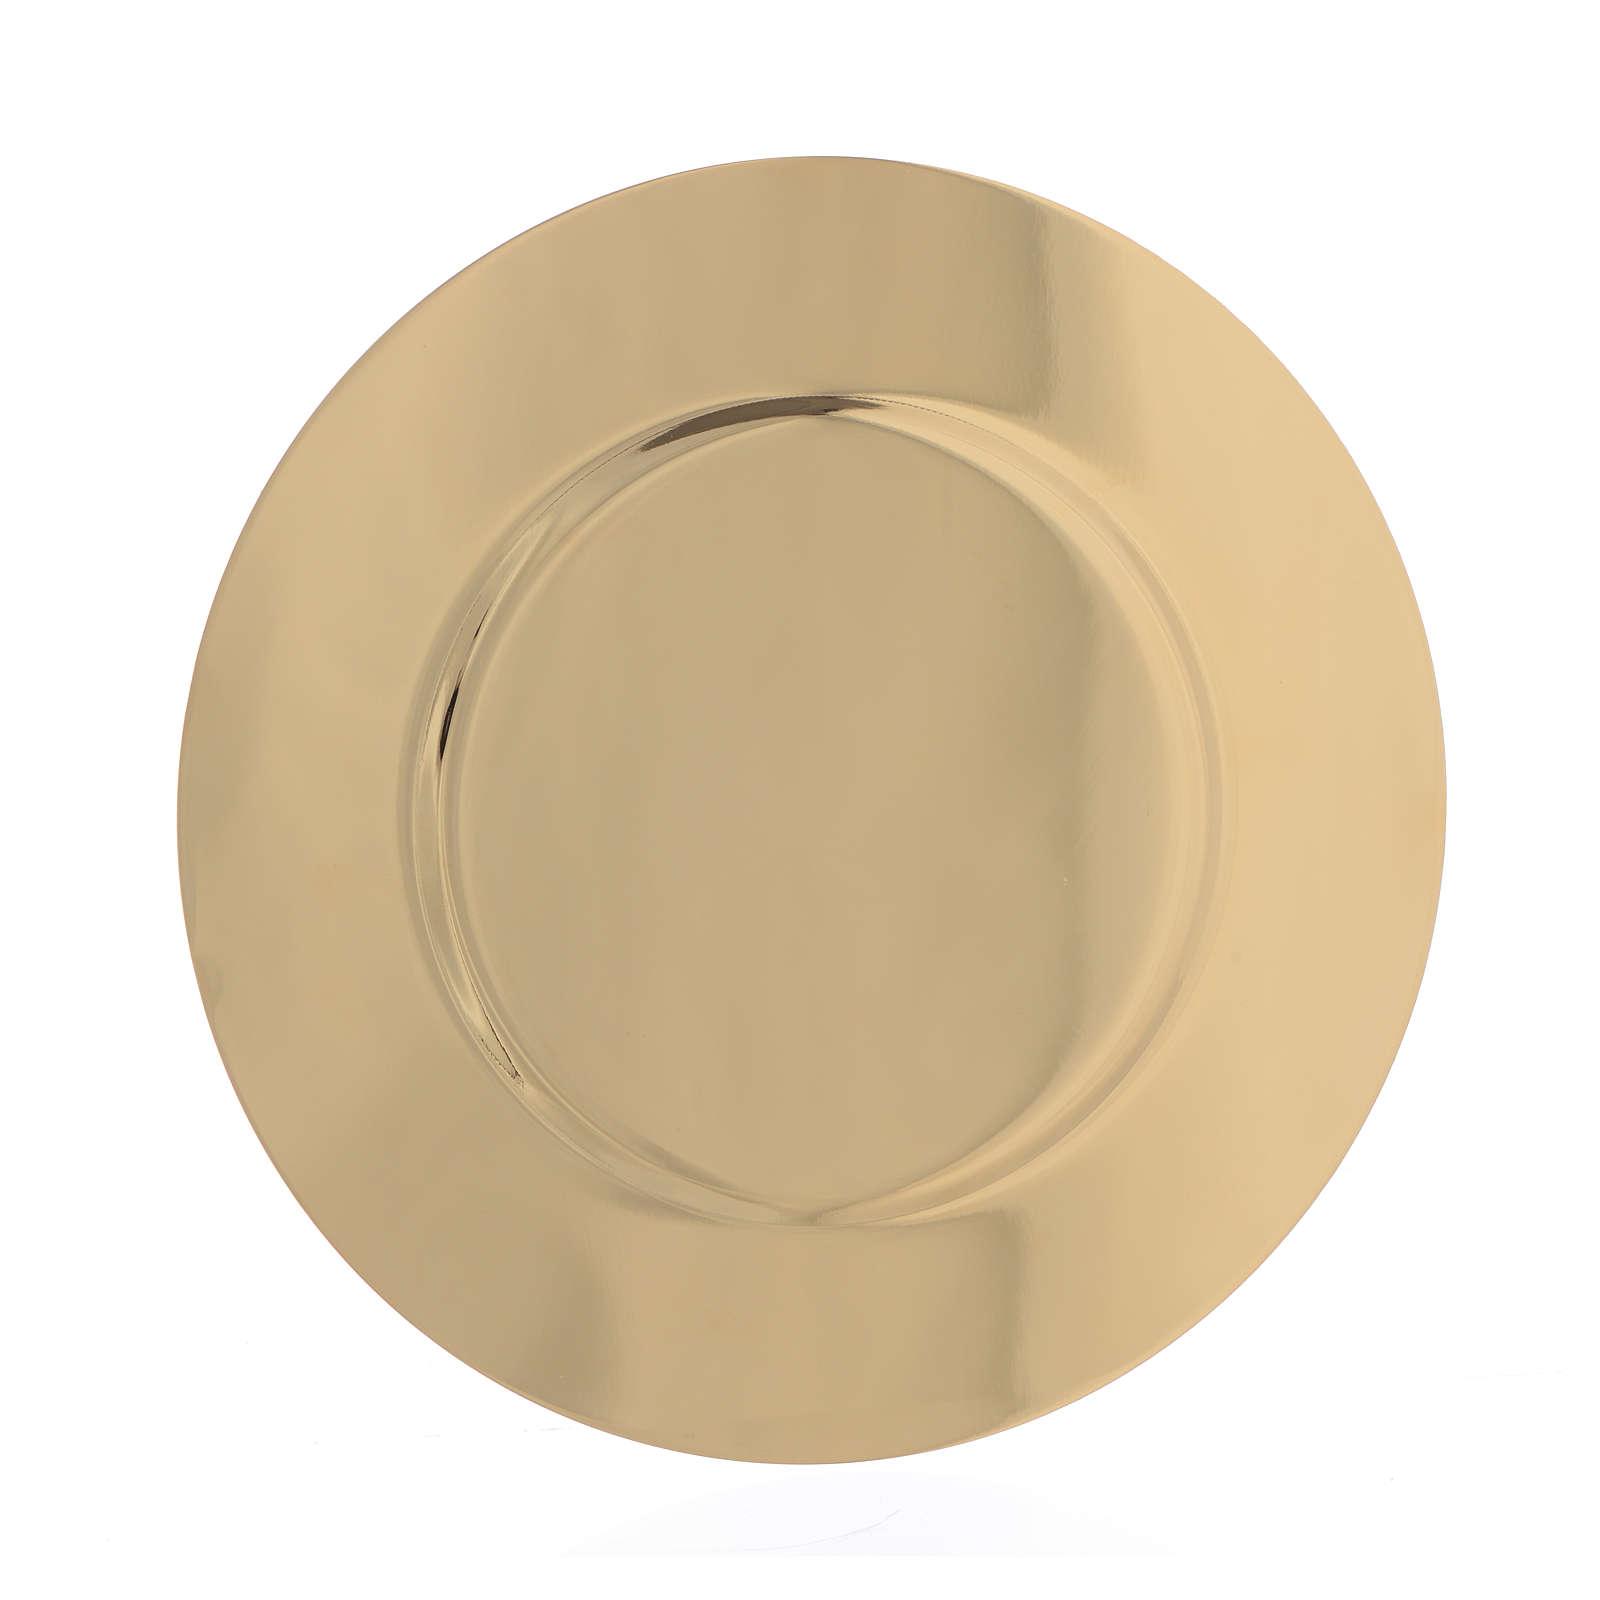 Patena ottone dorato sagomata diam 15,5 cm 4